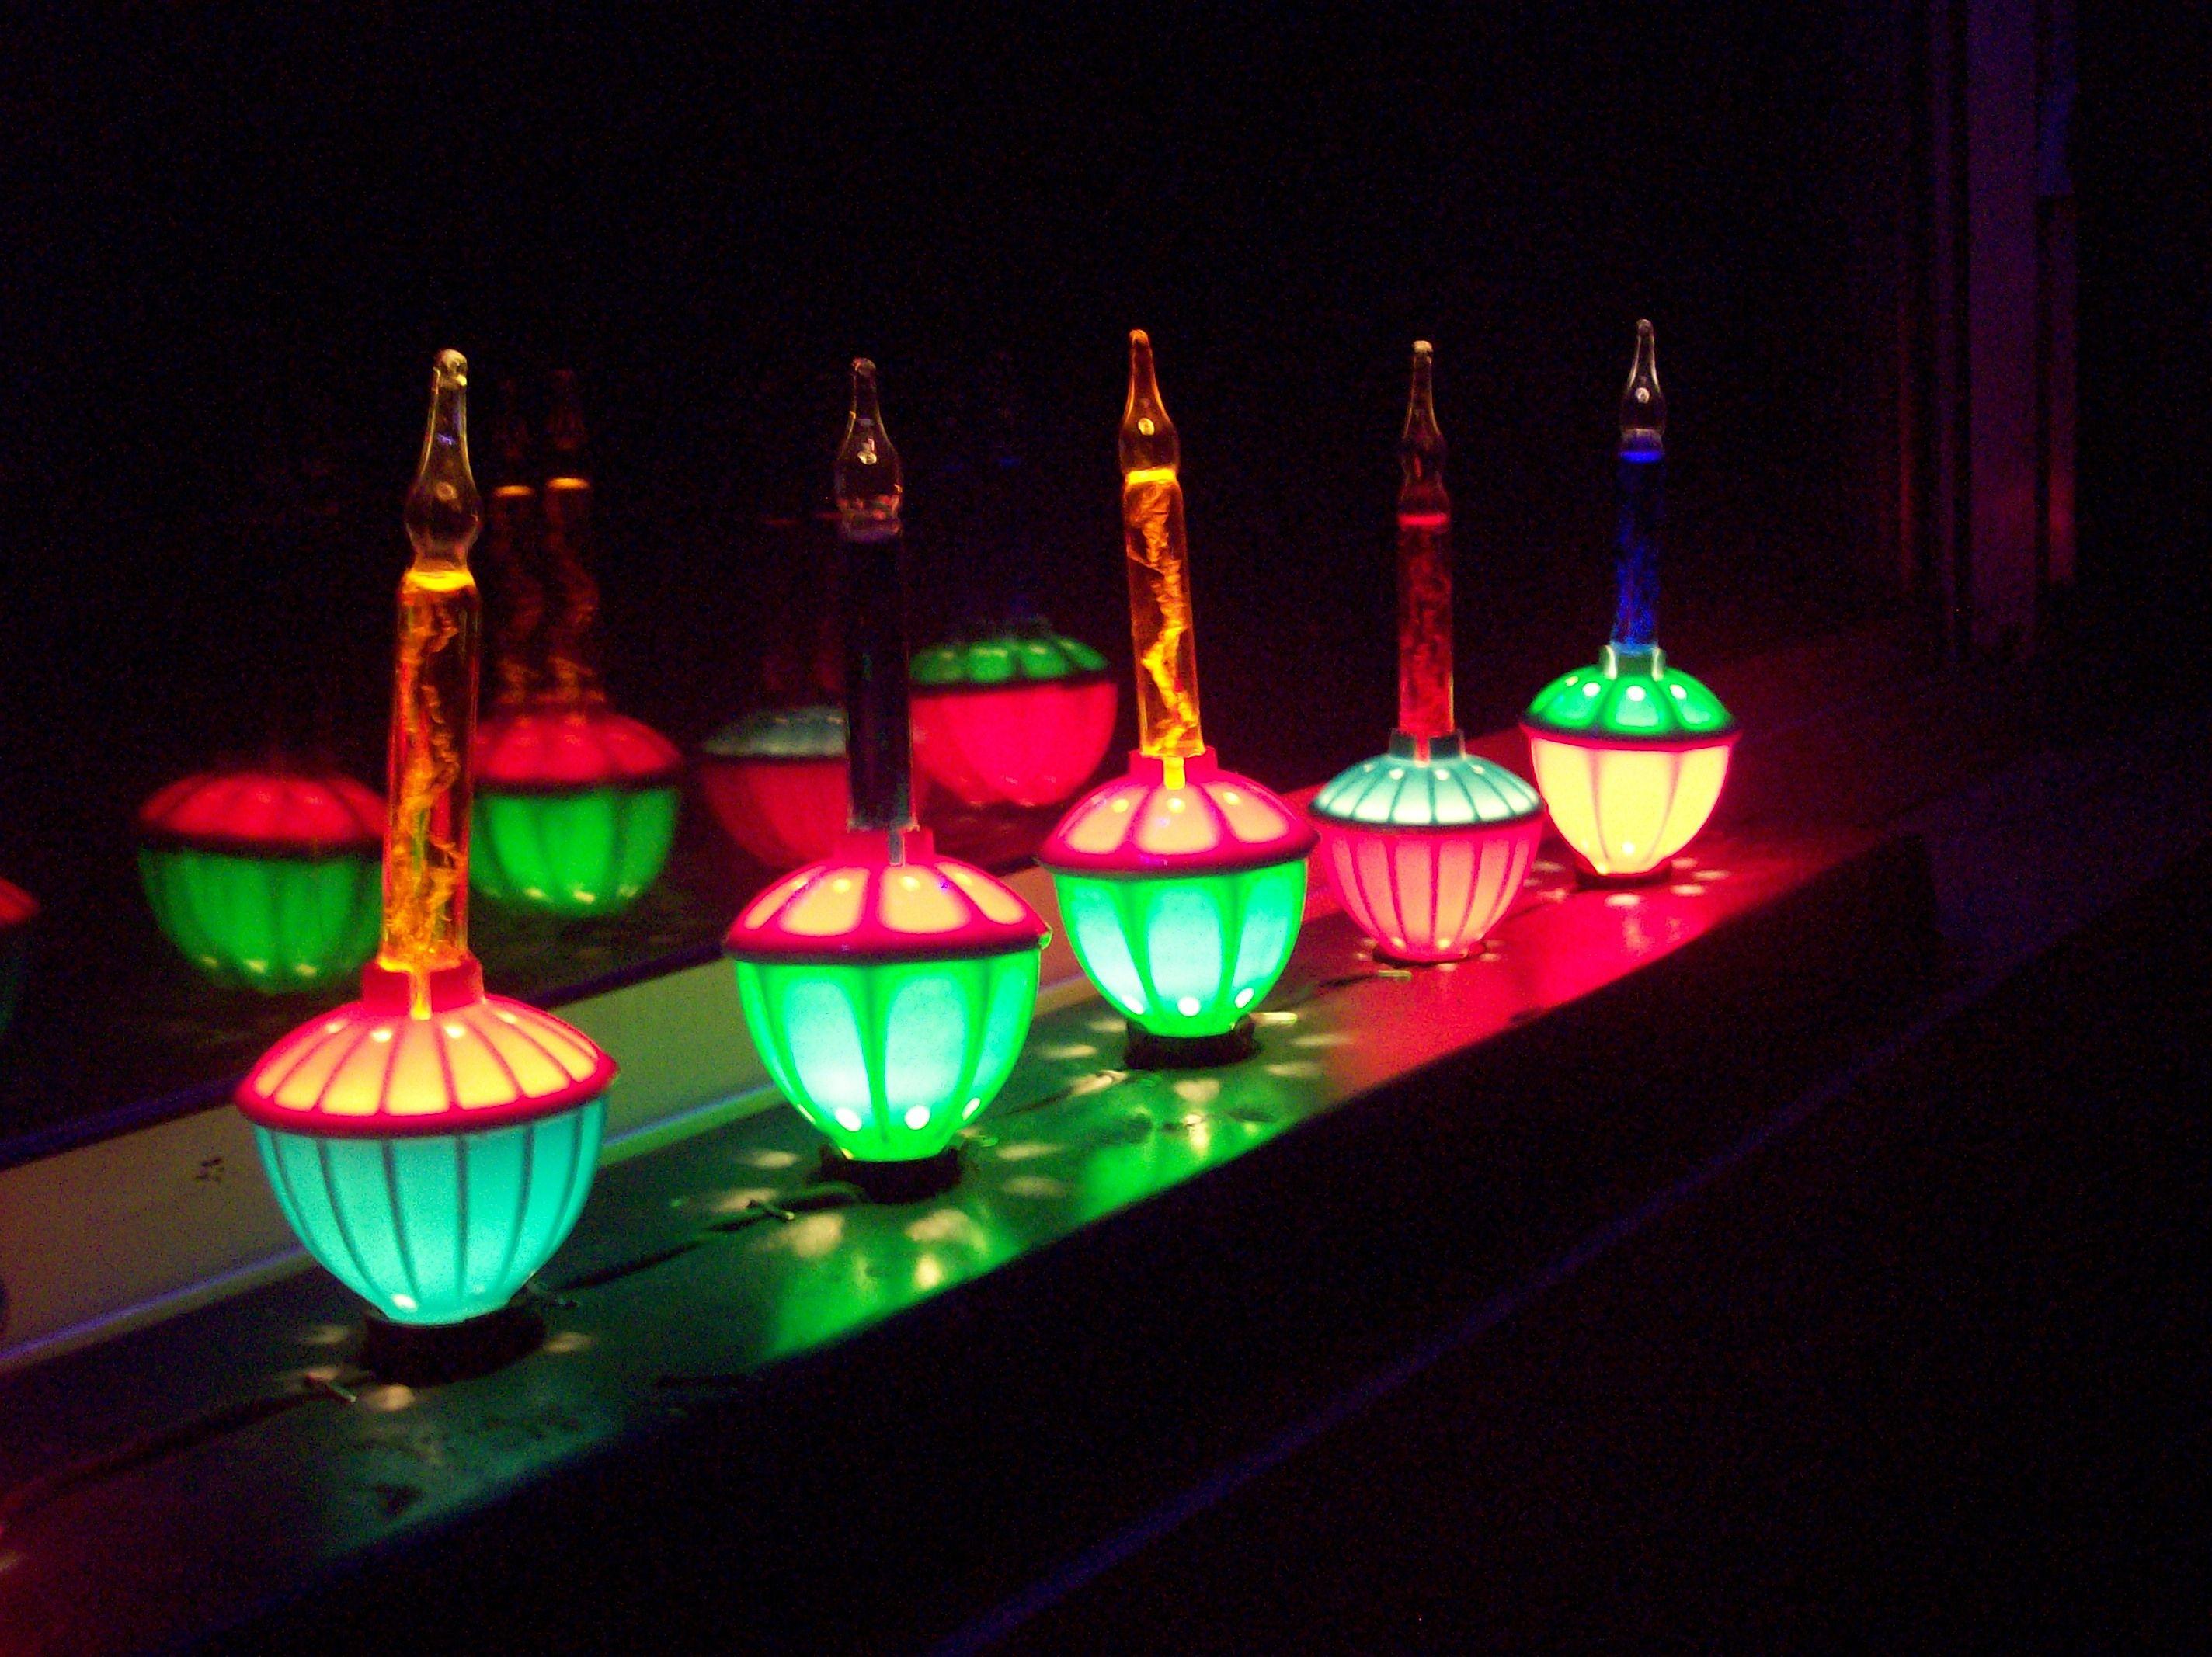 My bubble lights, I just love them!